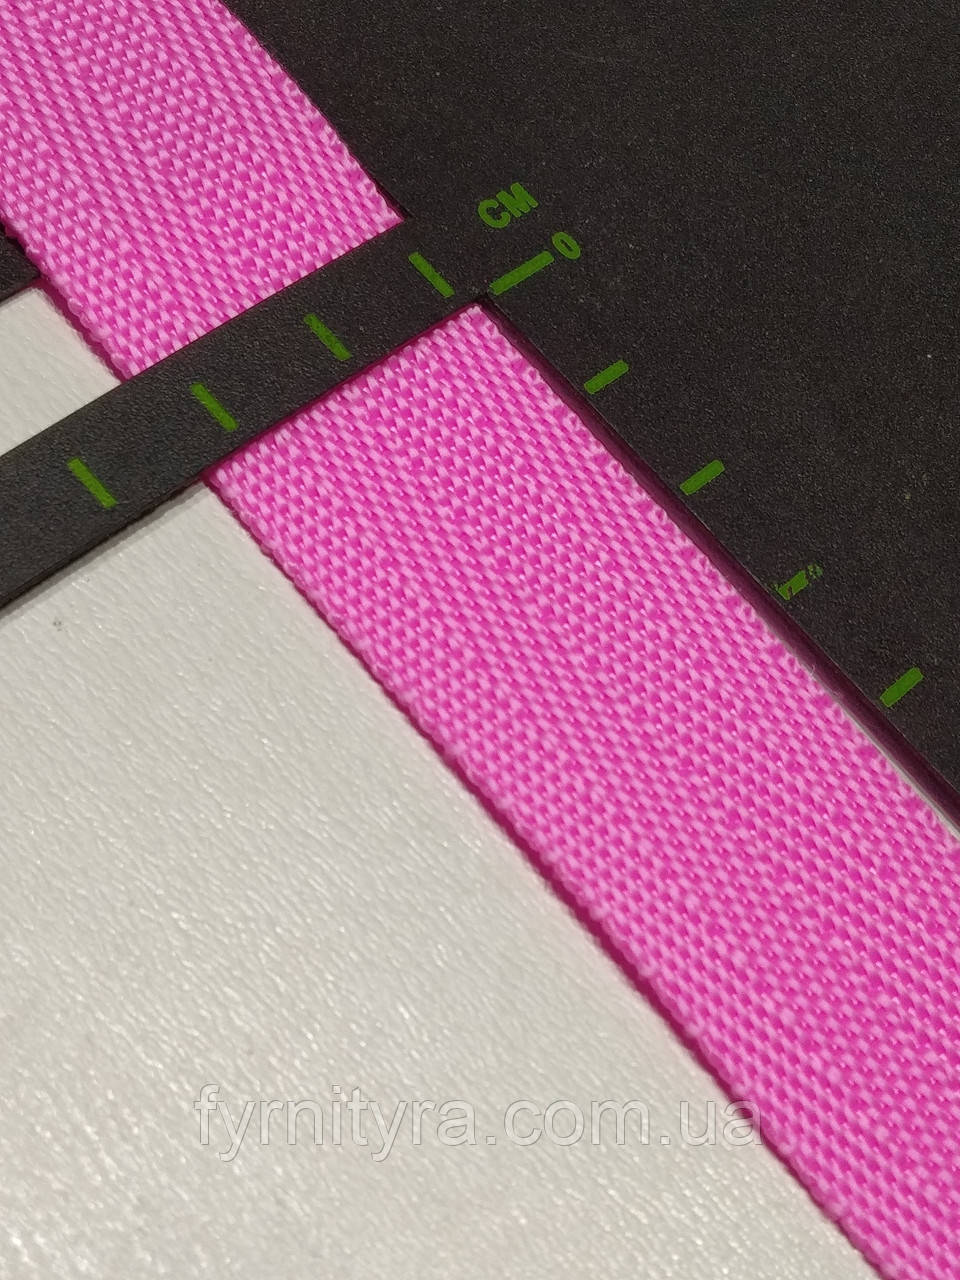 Тесьма сумочная, стропа 2.5 см розовая